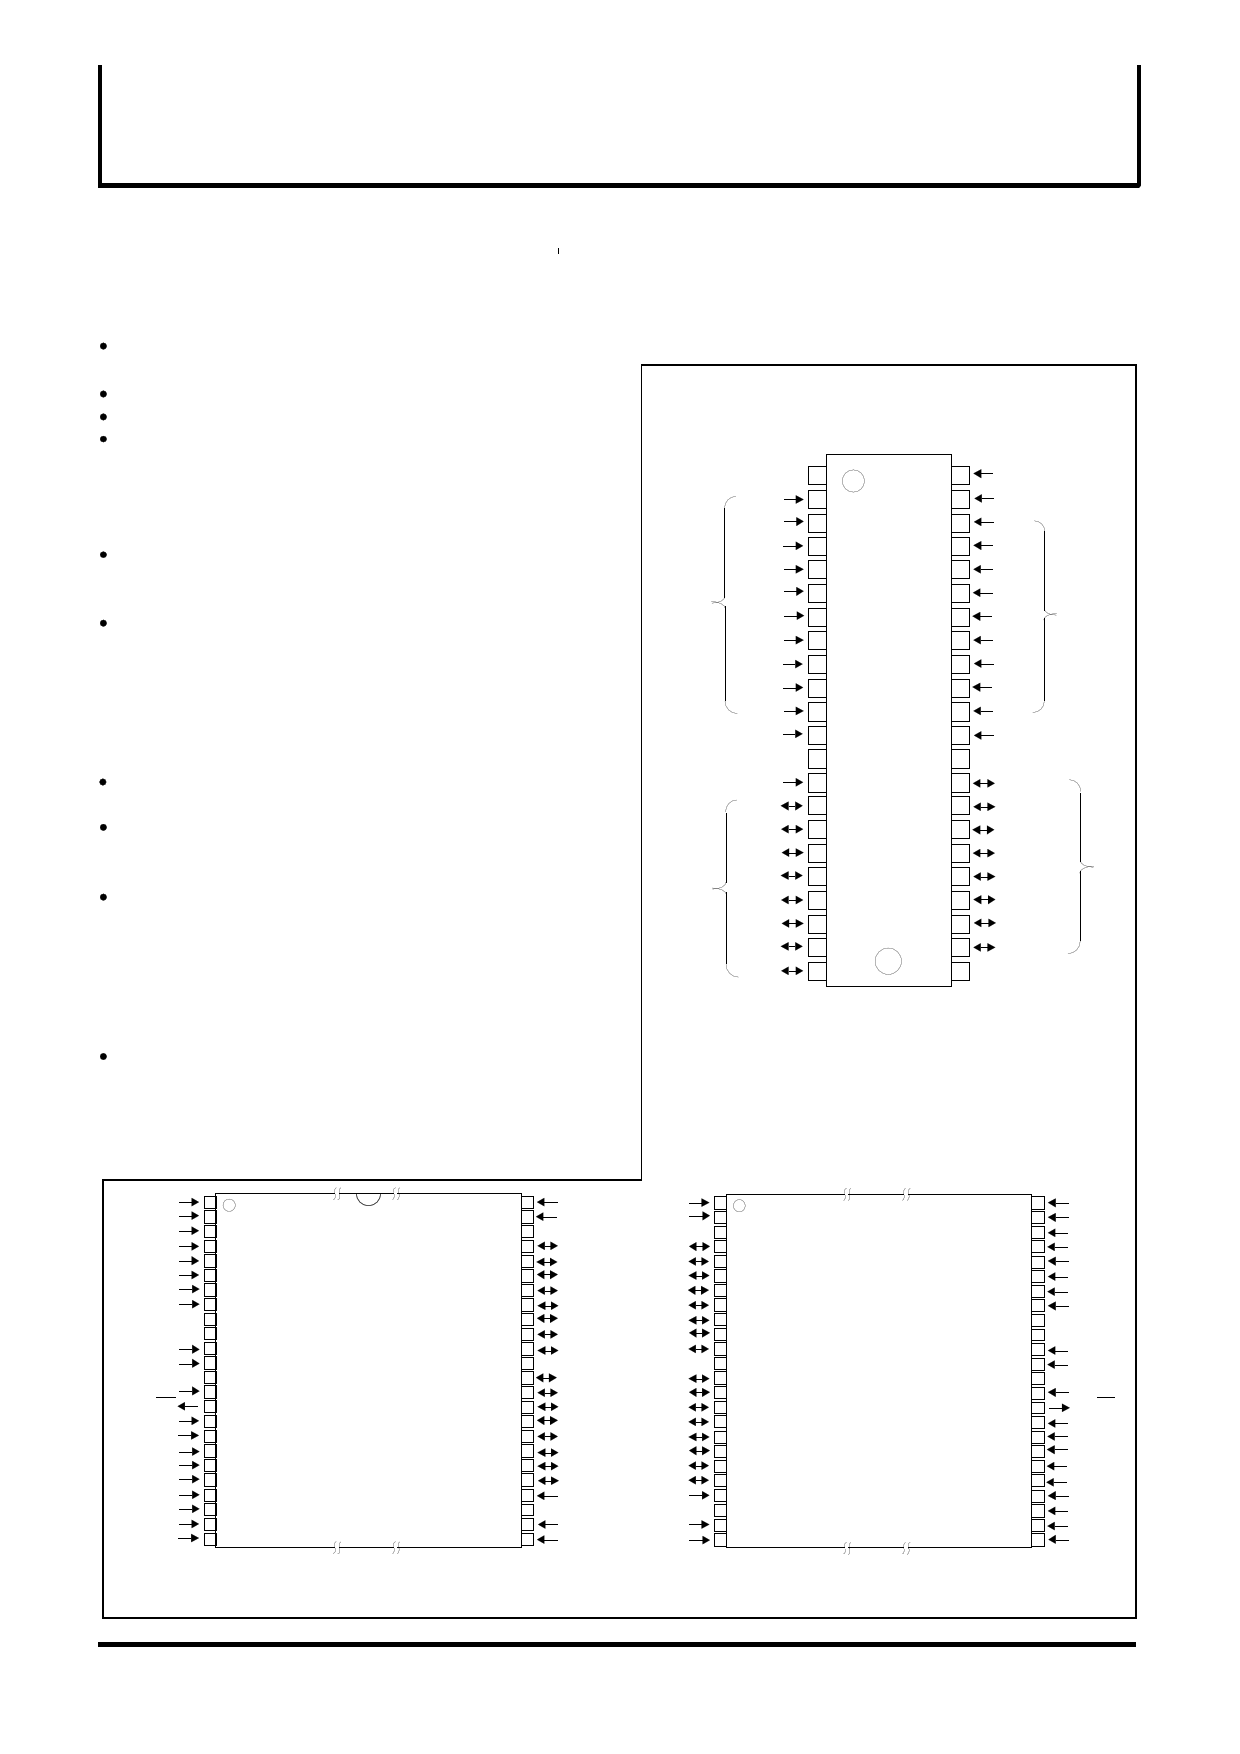 M5M29FB800VP-12 Datasheet, M5M29FB800VP-12 PDF,ピン配置, 機能